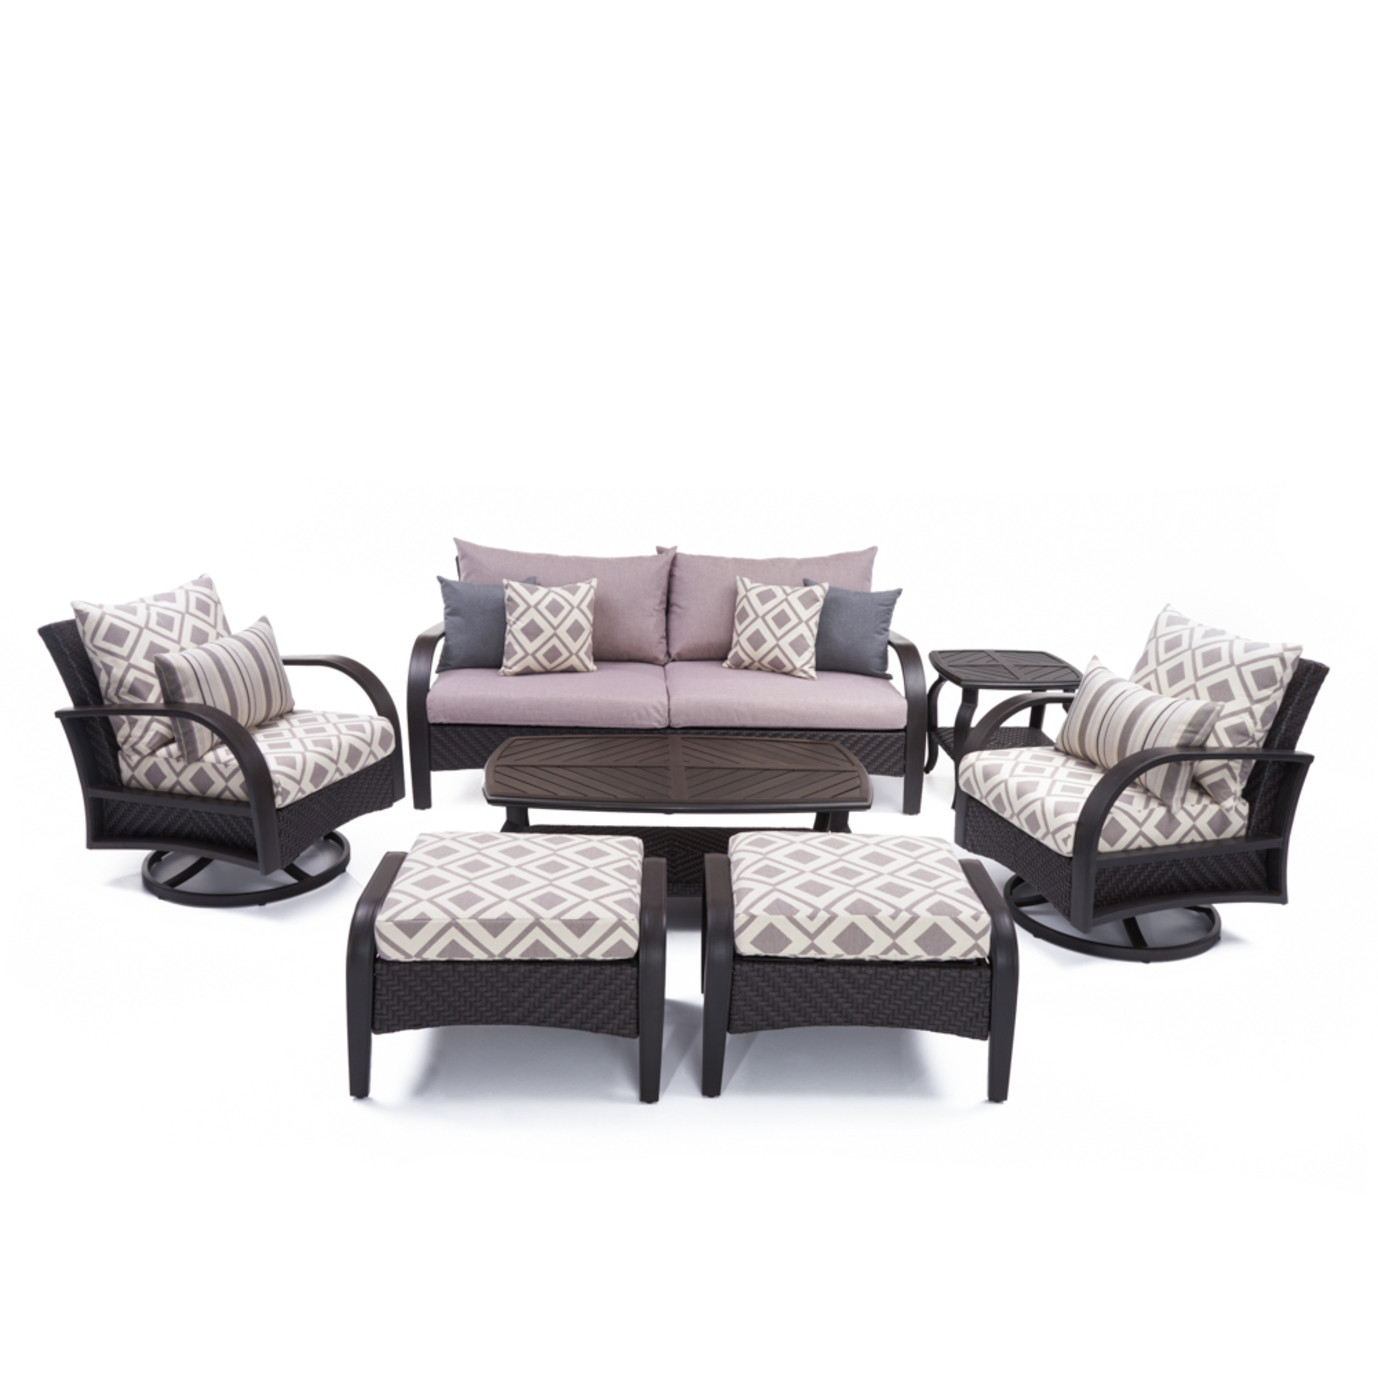 Barcelo™ 7pc Motion Club Deep Seating Set - Wisteria Lavender